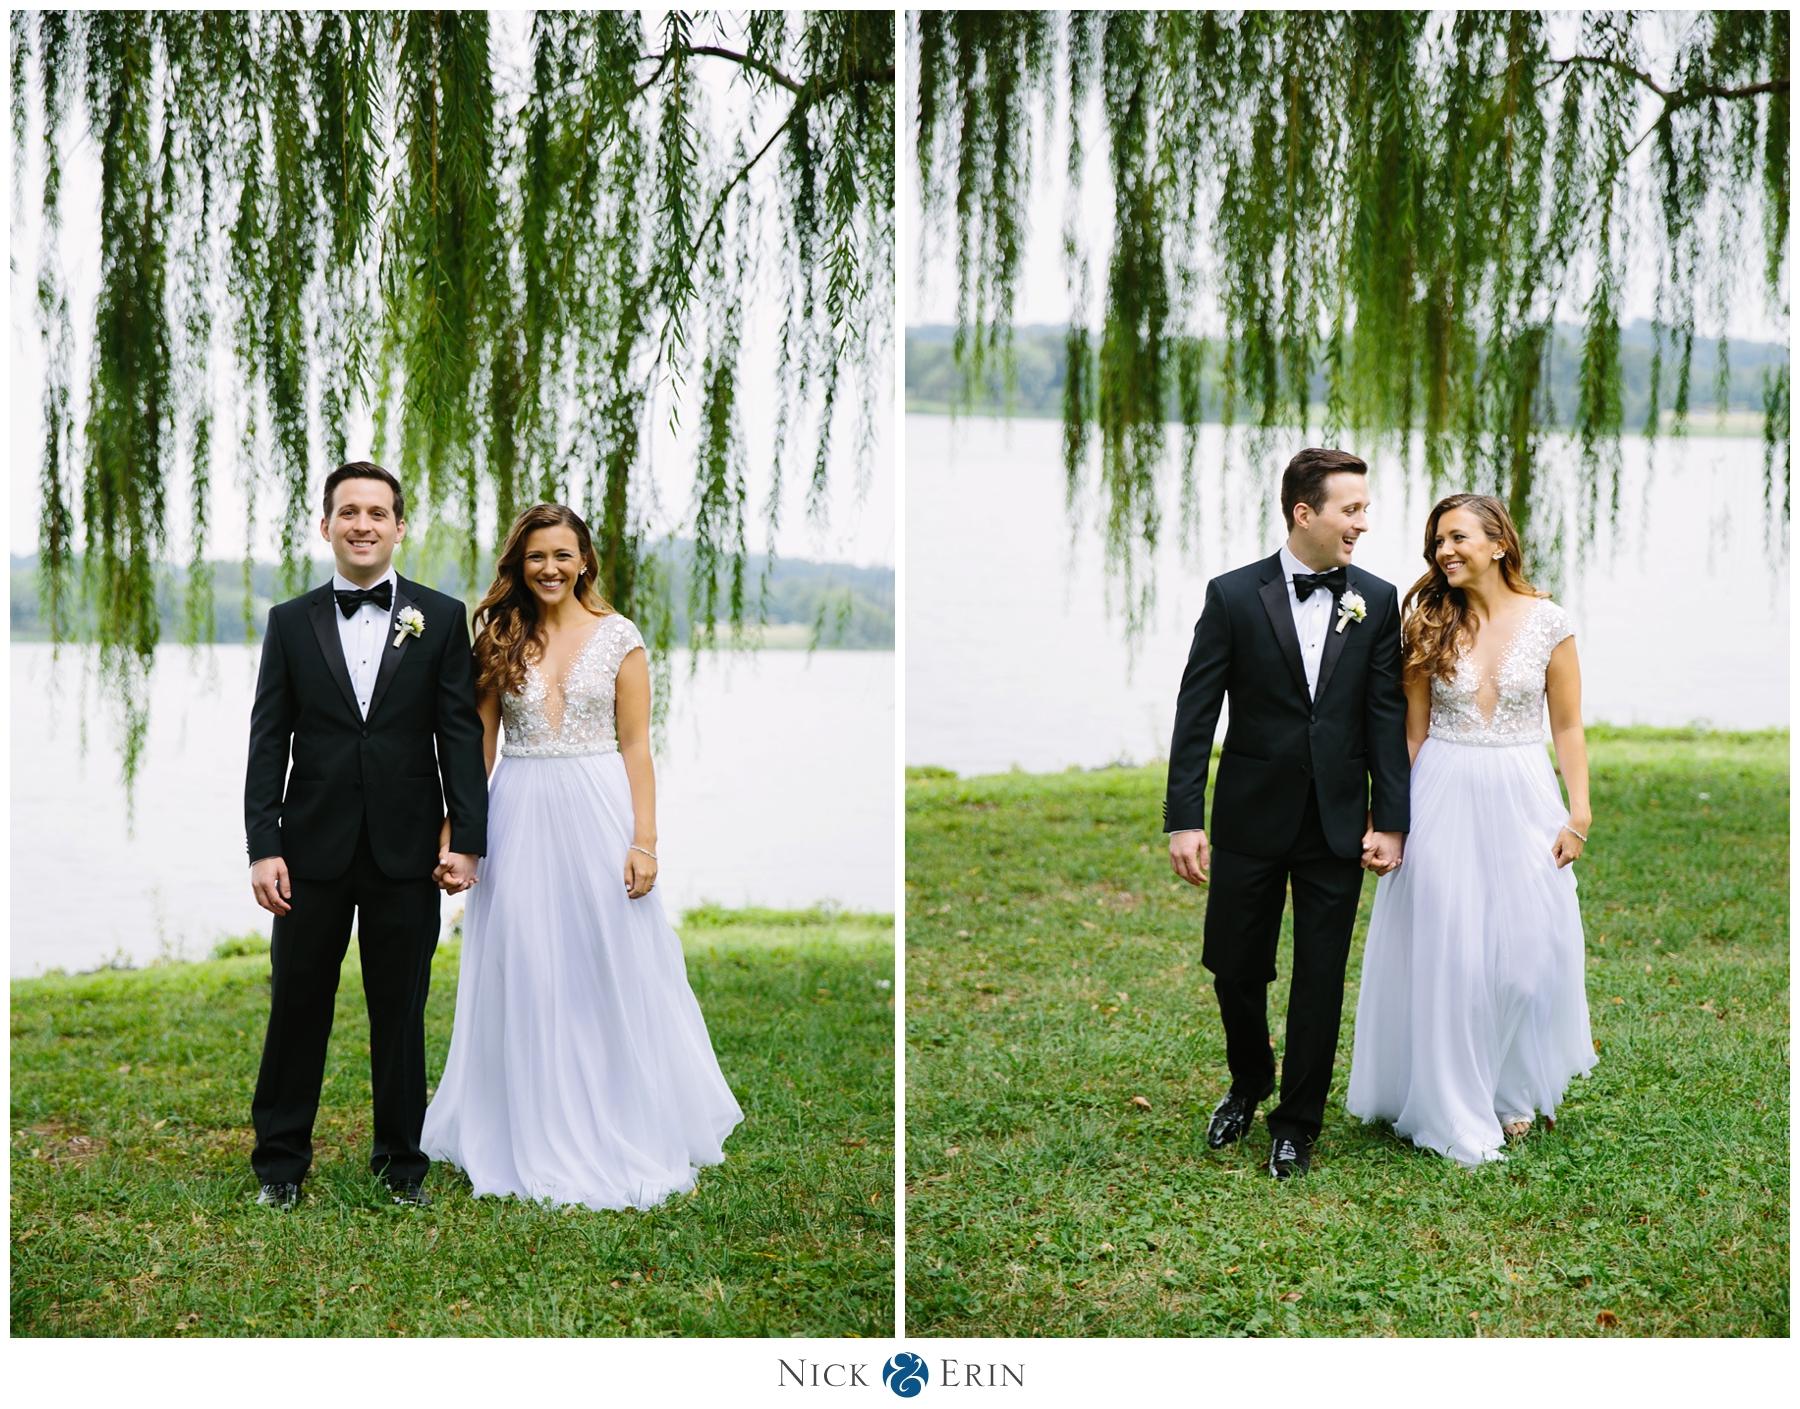 donner_photography_washington-dc-wedding_ariel-patrick_0036